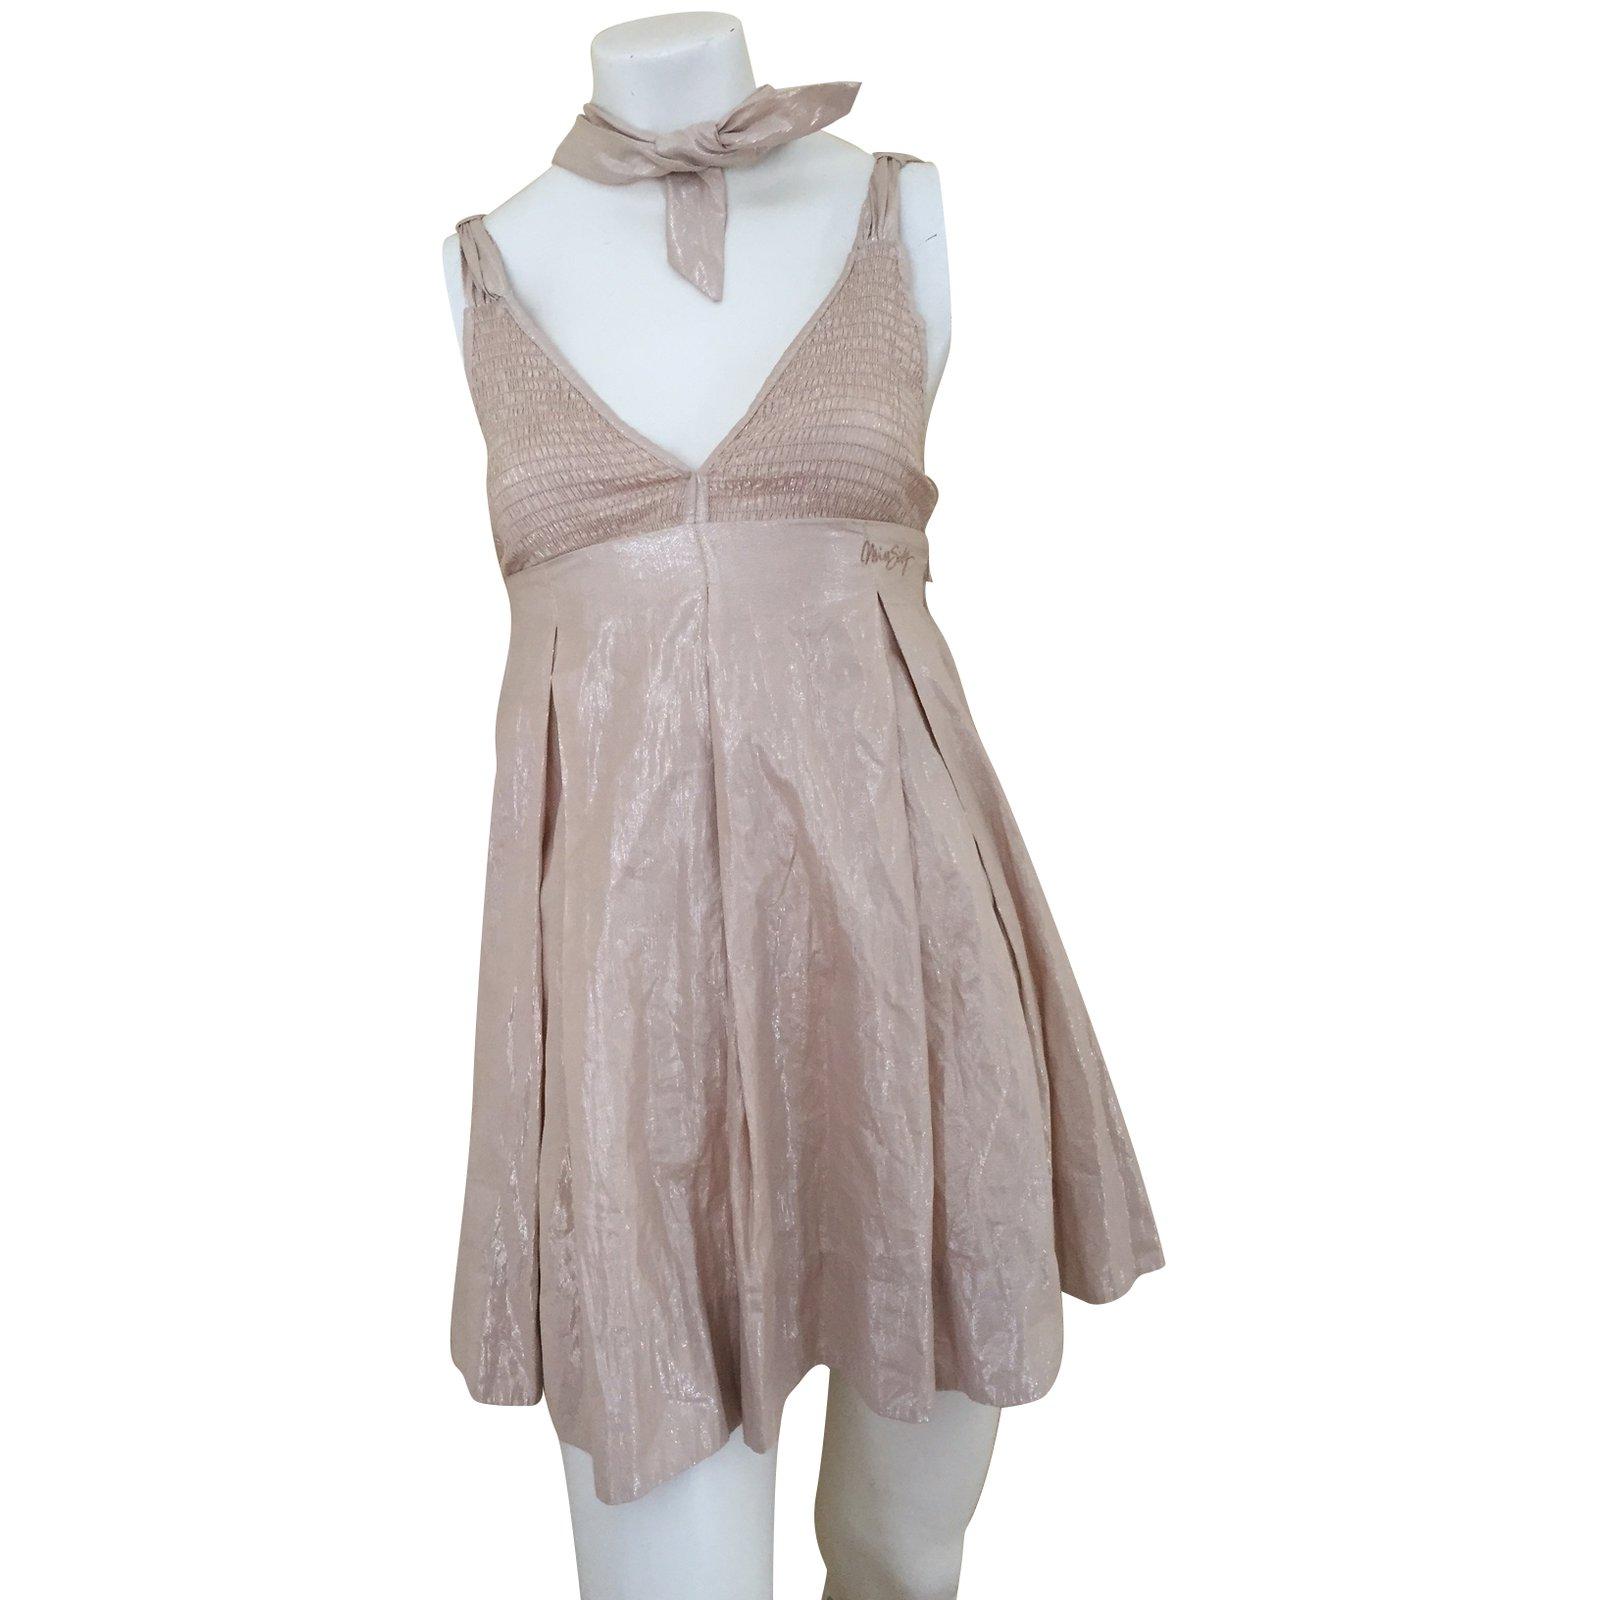 Miss Sixty Dresses Cotton Beige Ref 50086